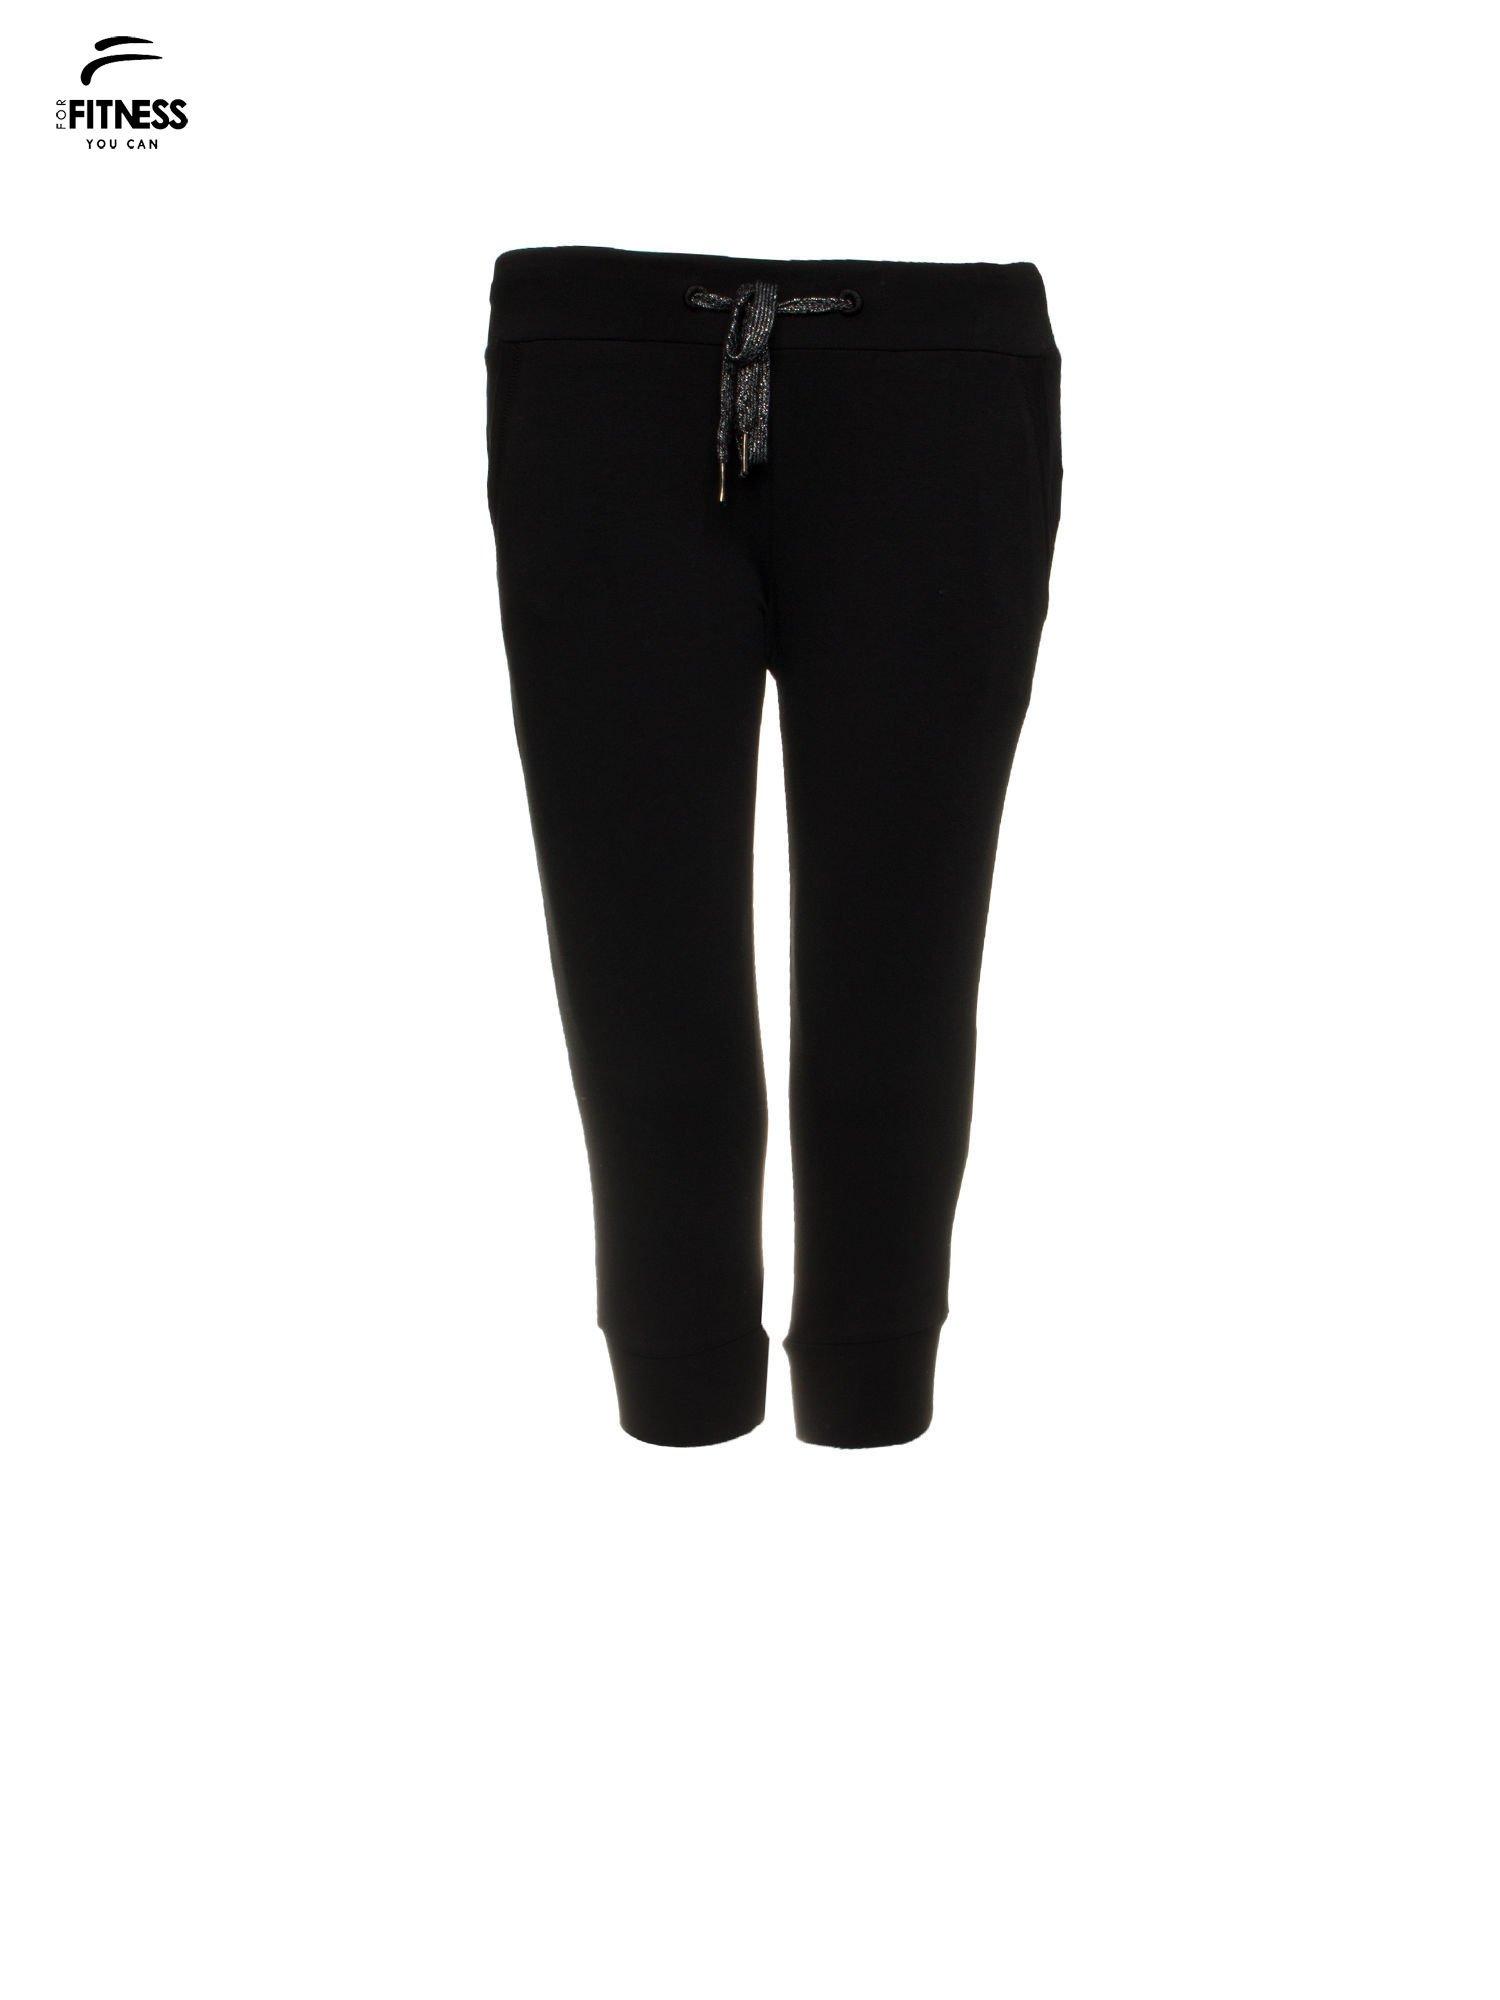 Czarne sportowe spodnie za kolano typu capri                                  zdj.                                  2